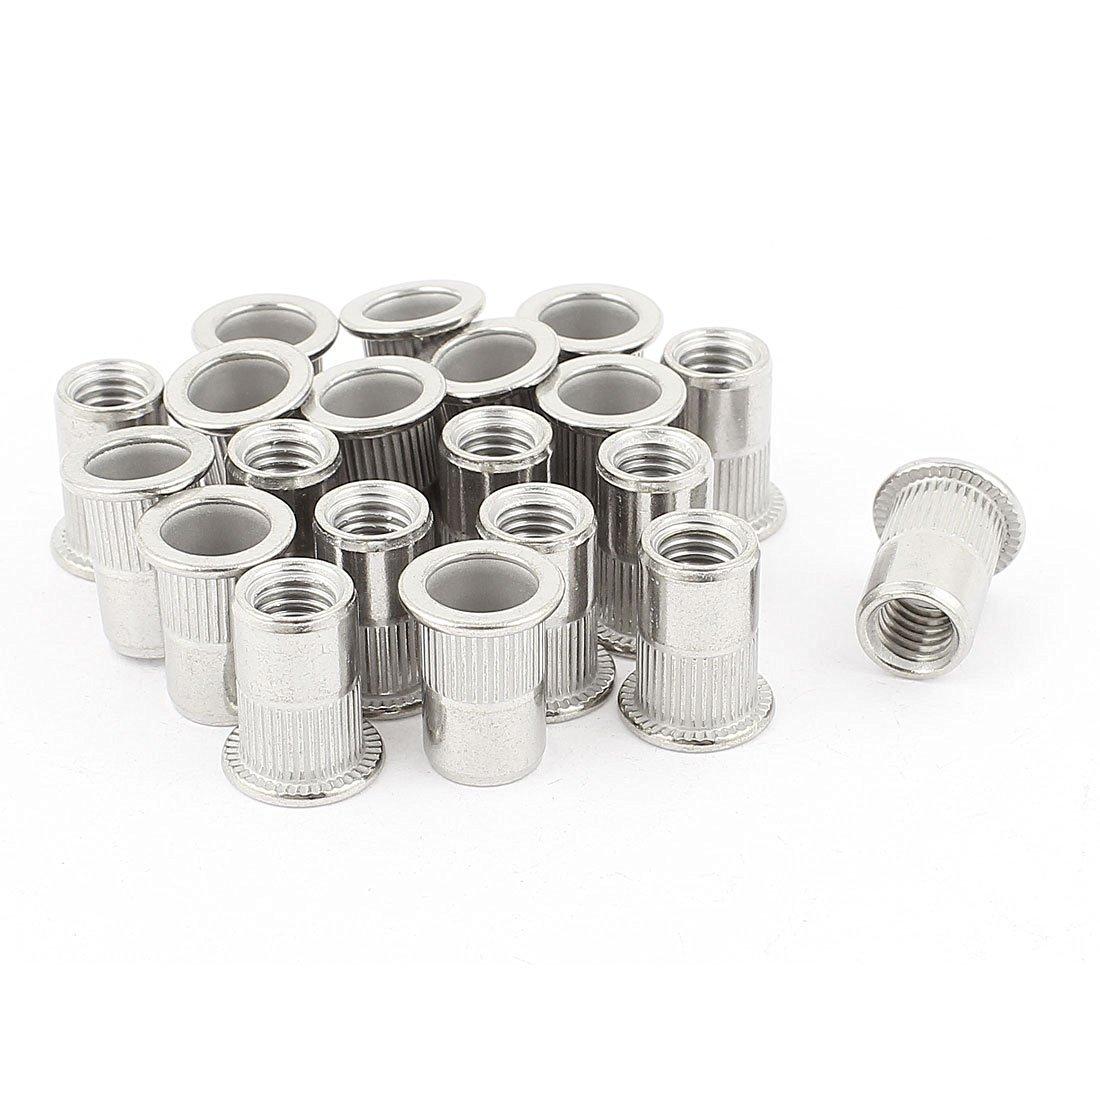 20 Pcs 304 Stainless Steel Rivet Nut Insert M8x18mm Silver